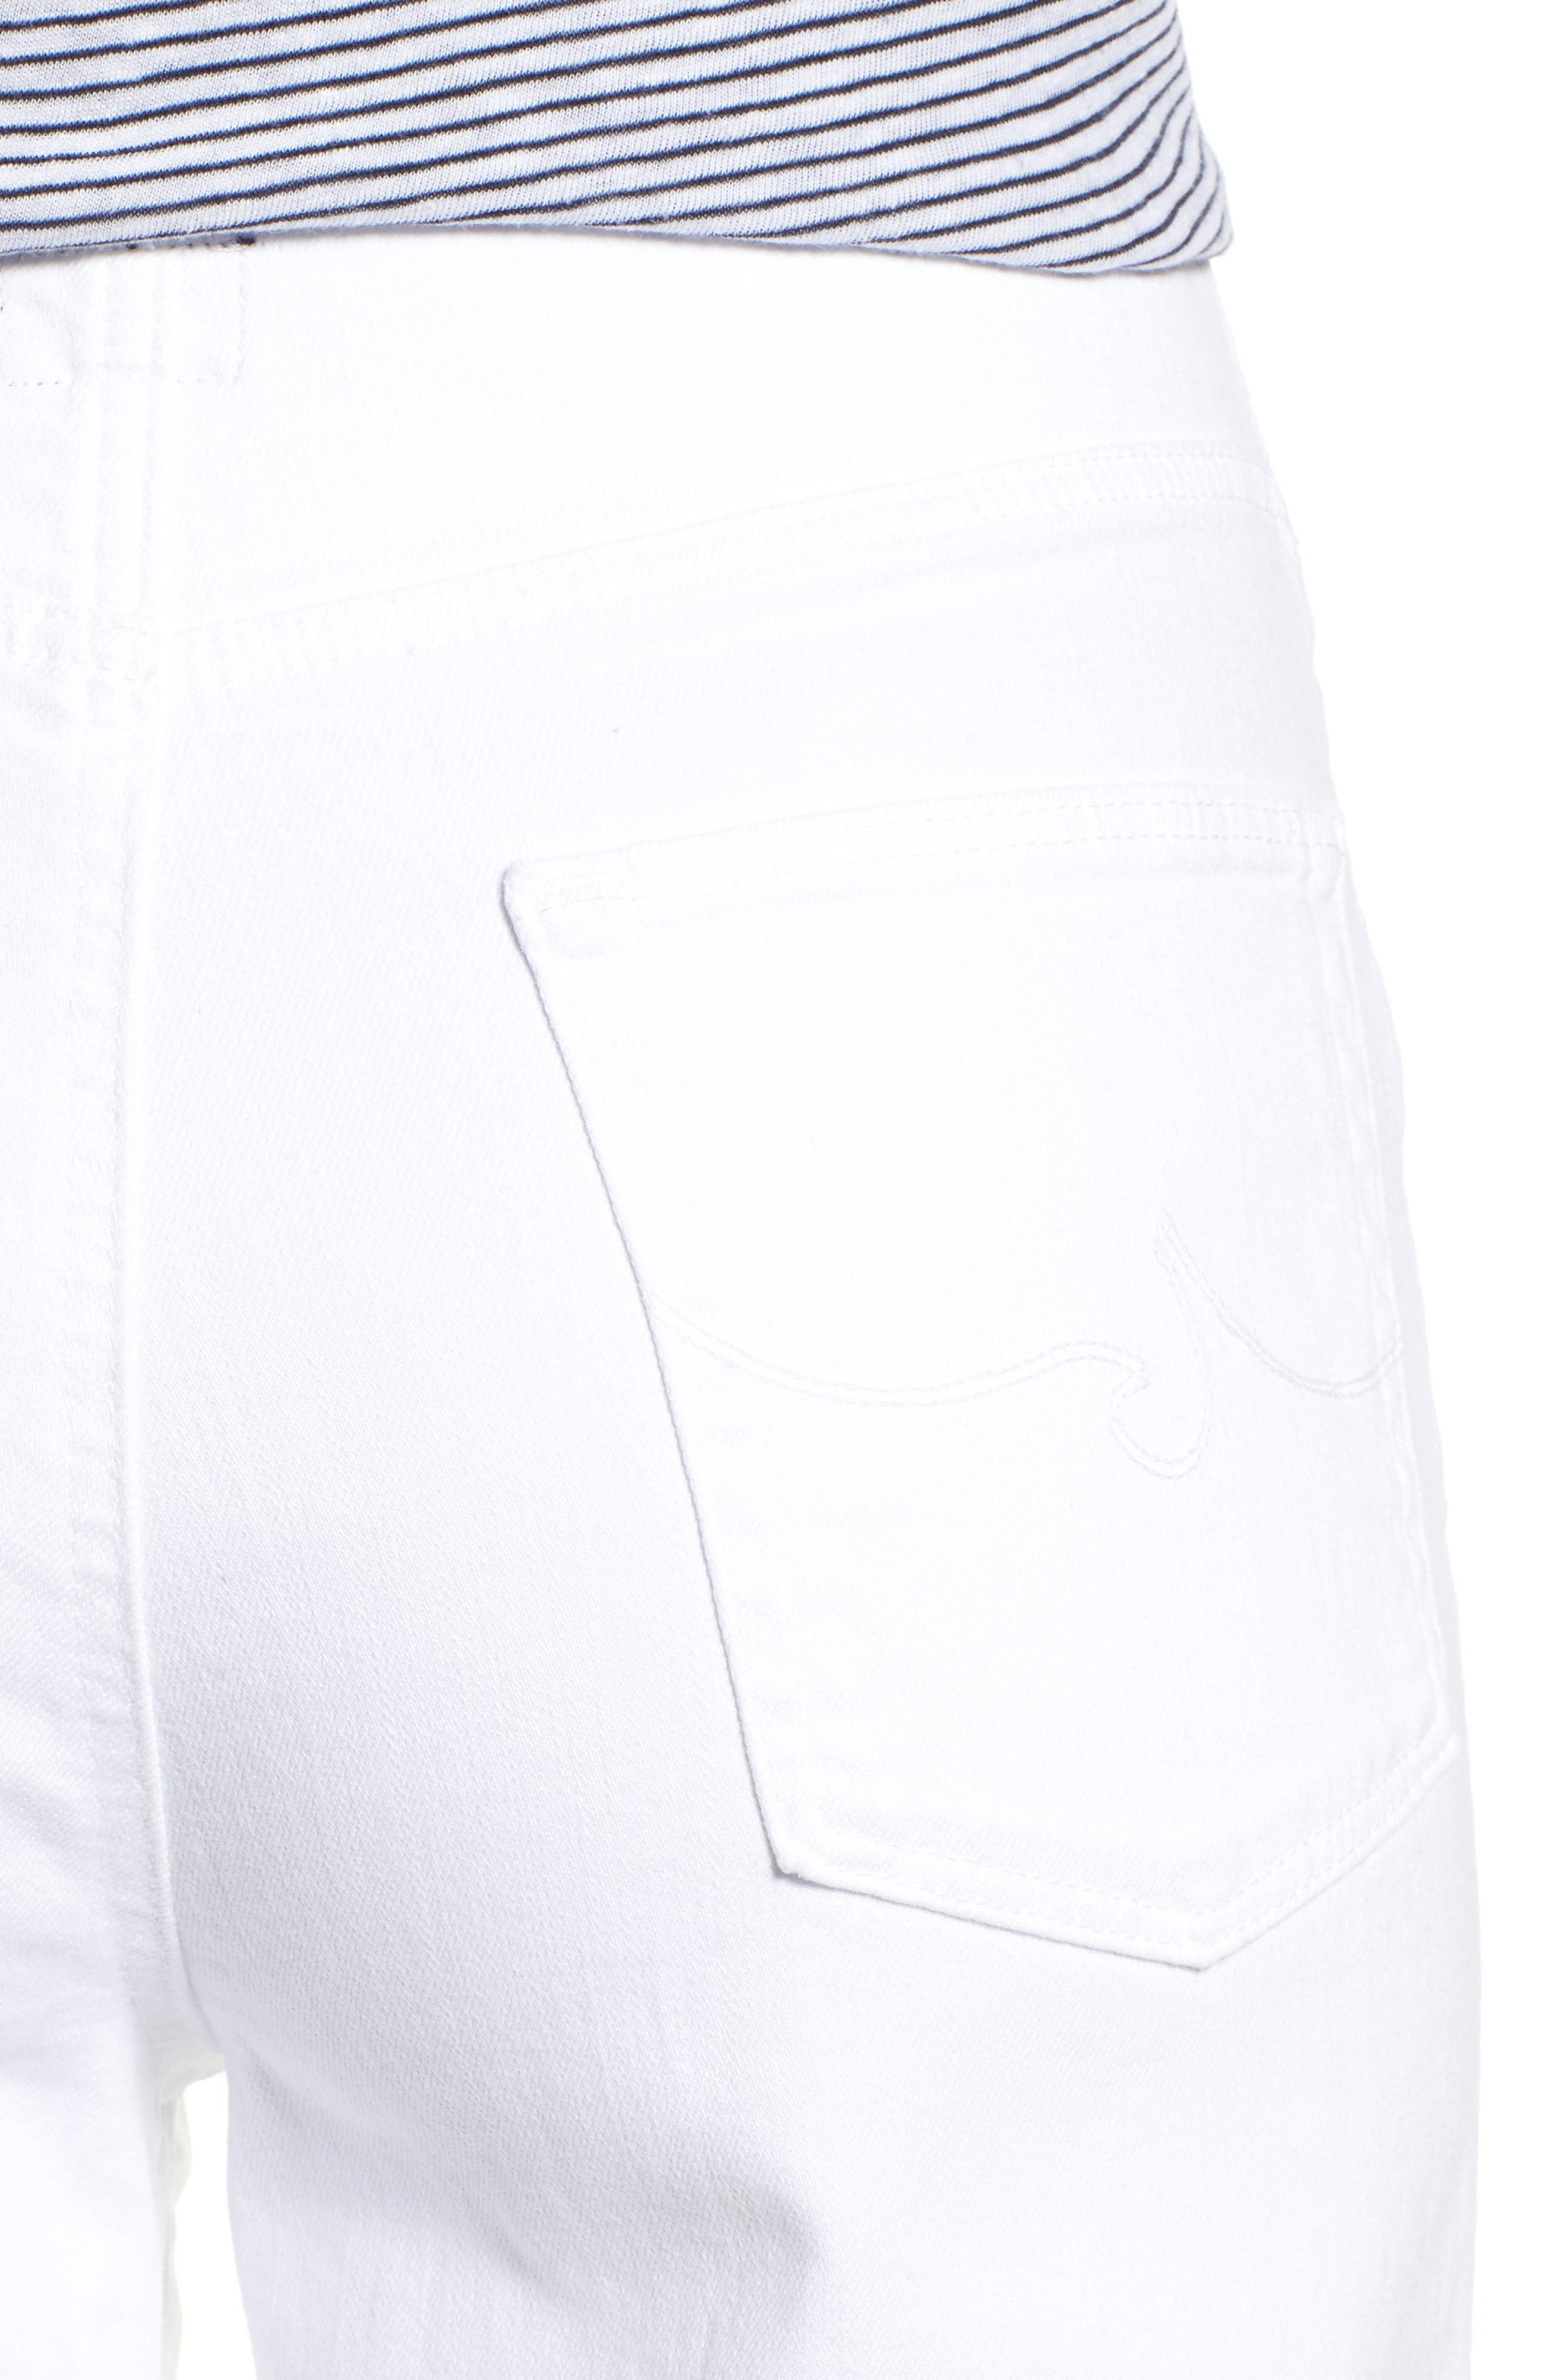 Etta High Waist Crop Wide Leg Jeans,                             Alternate thumbnail 4, color,                             110